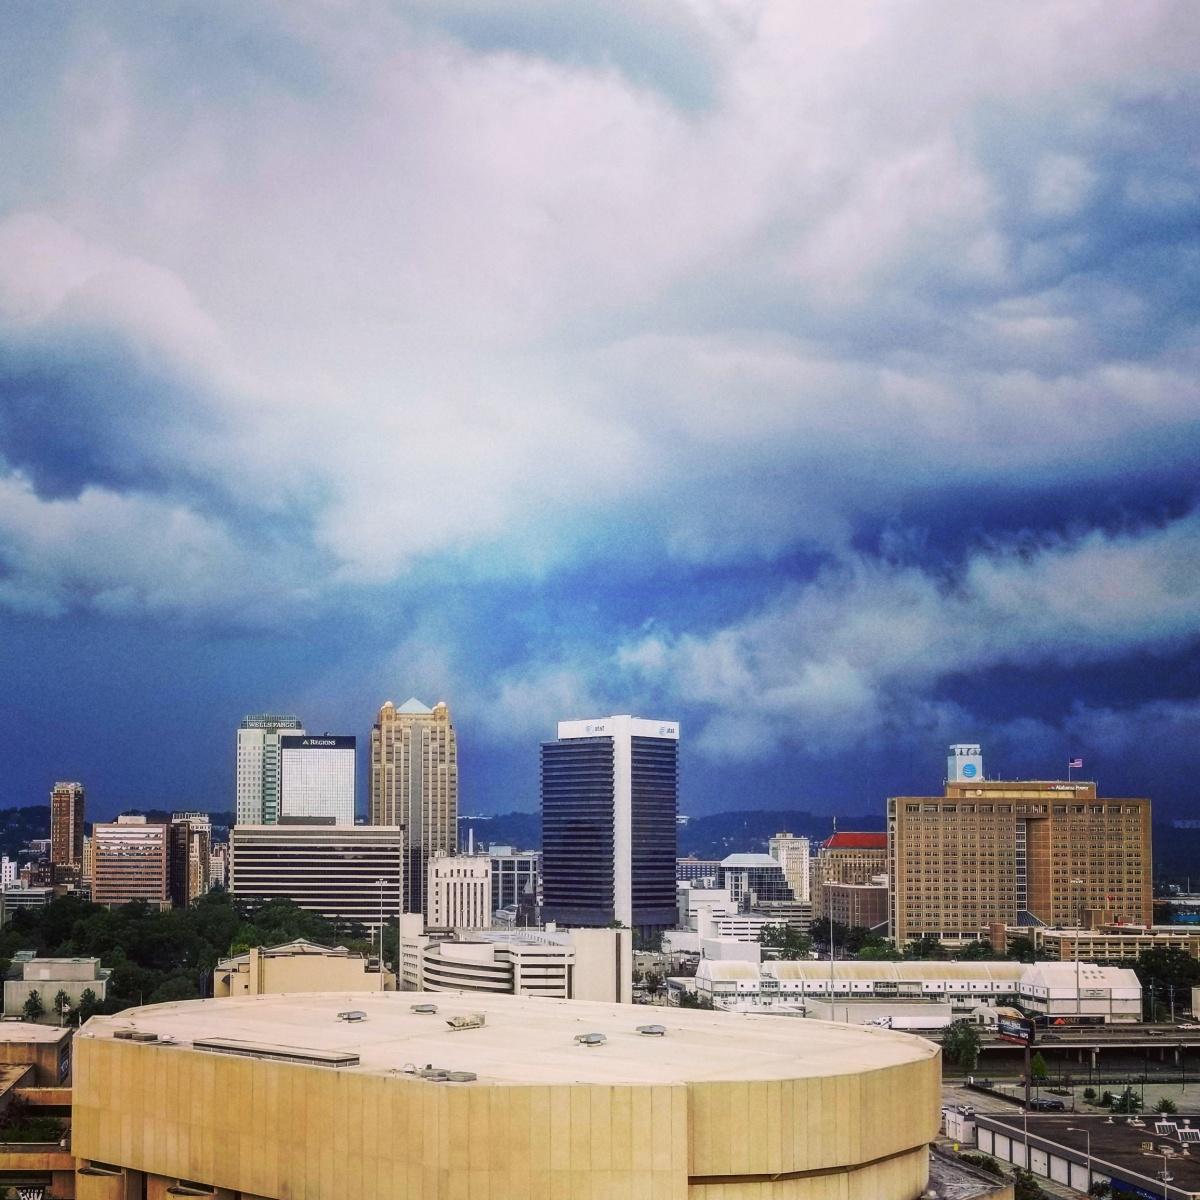 When Storm CloudsGather